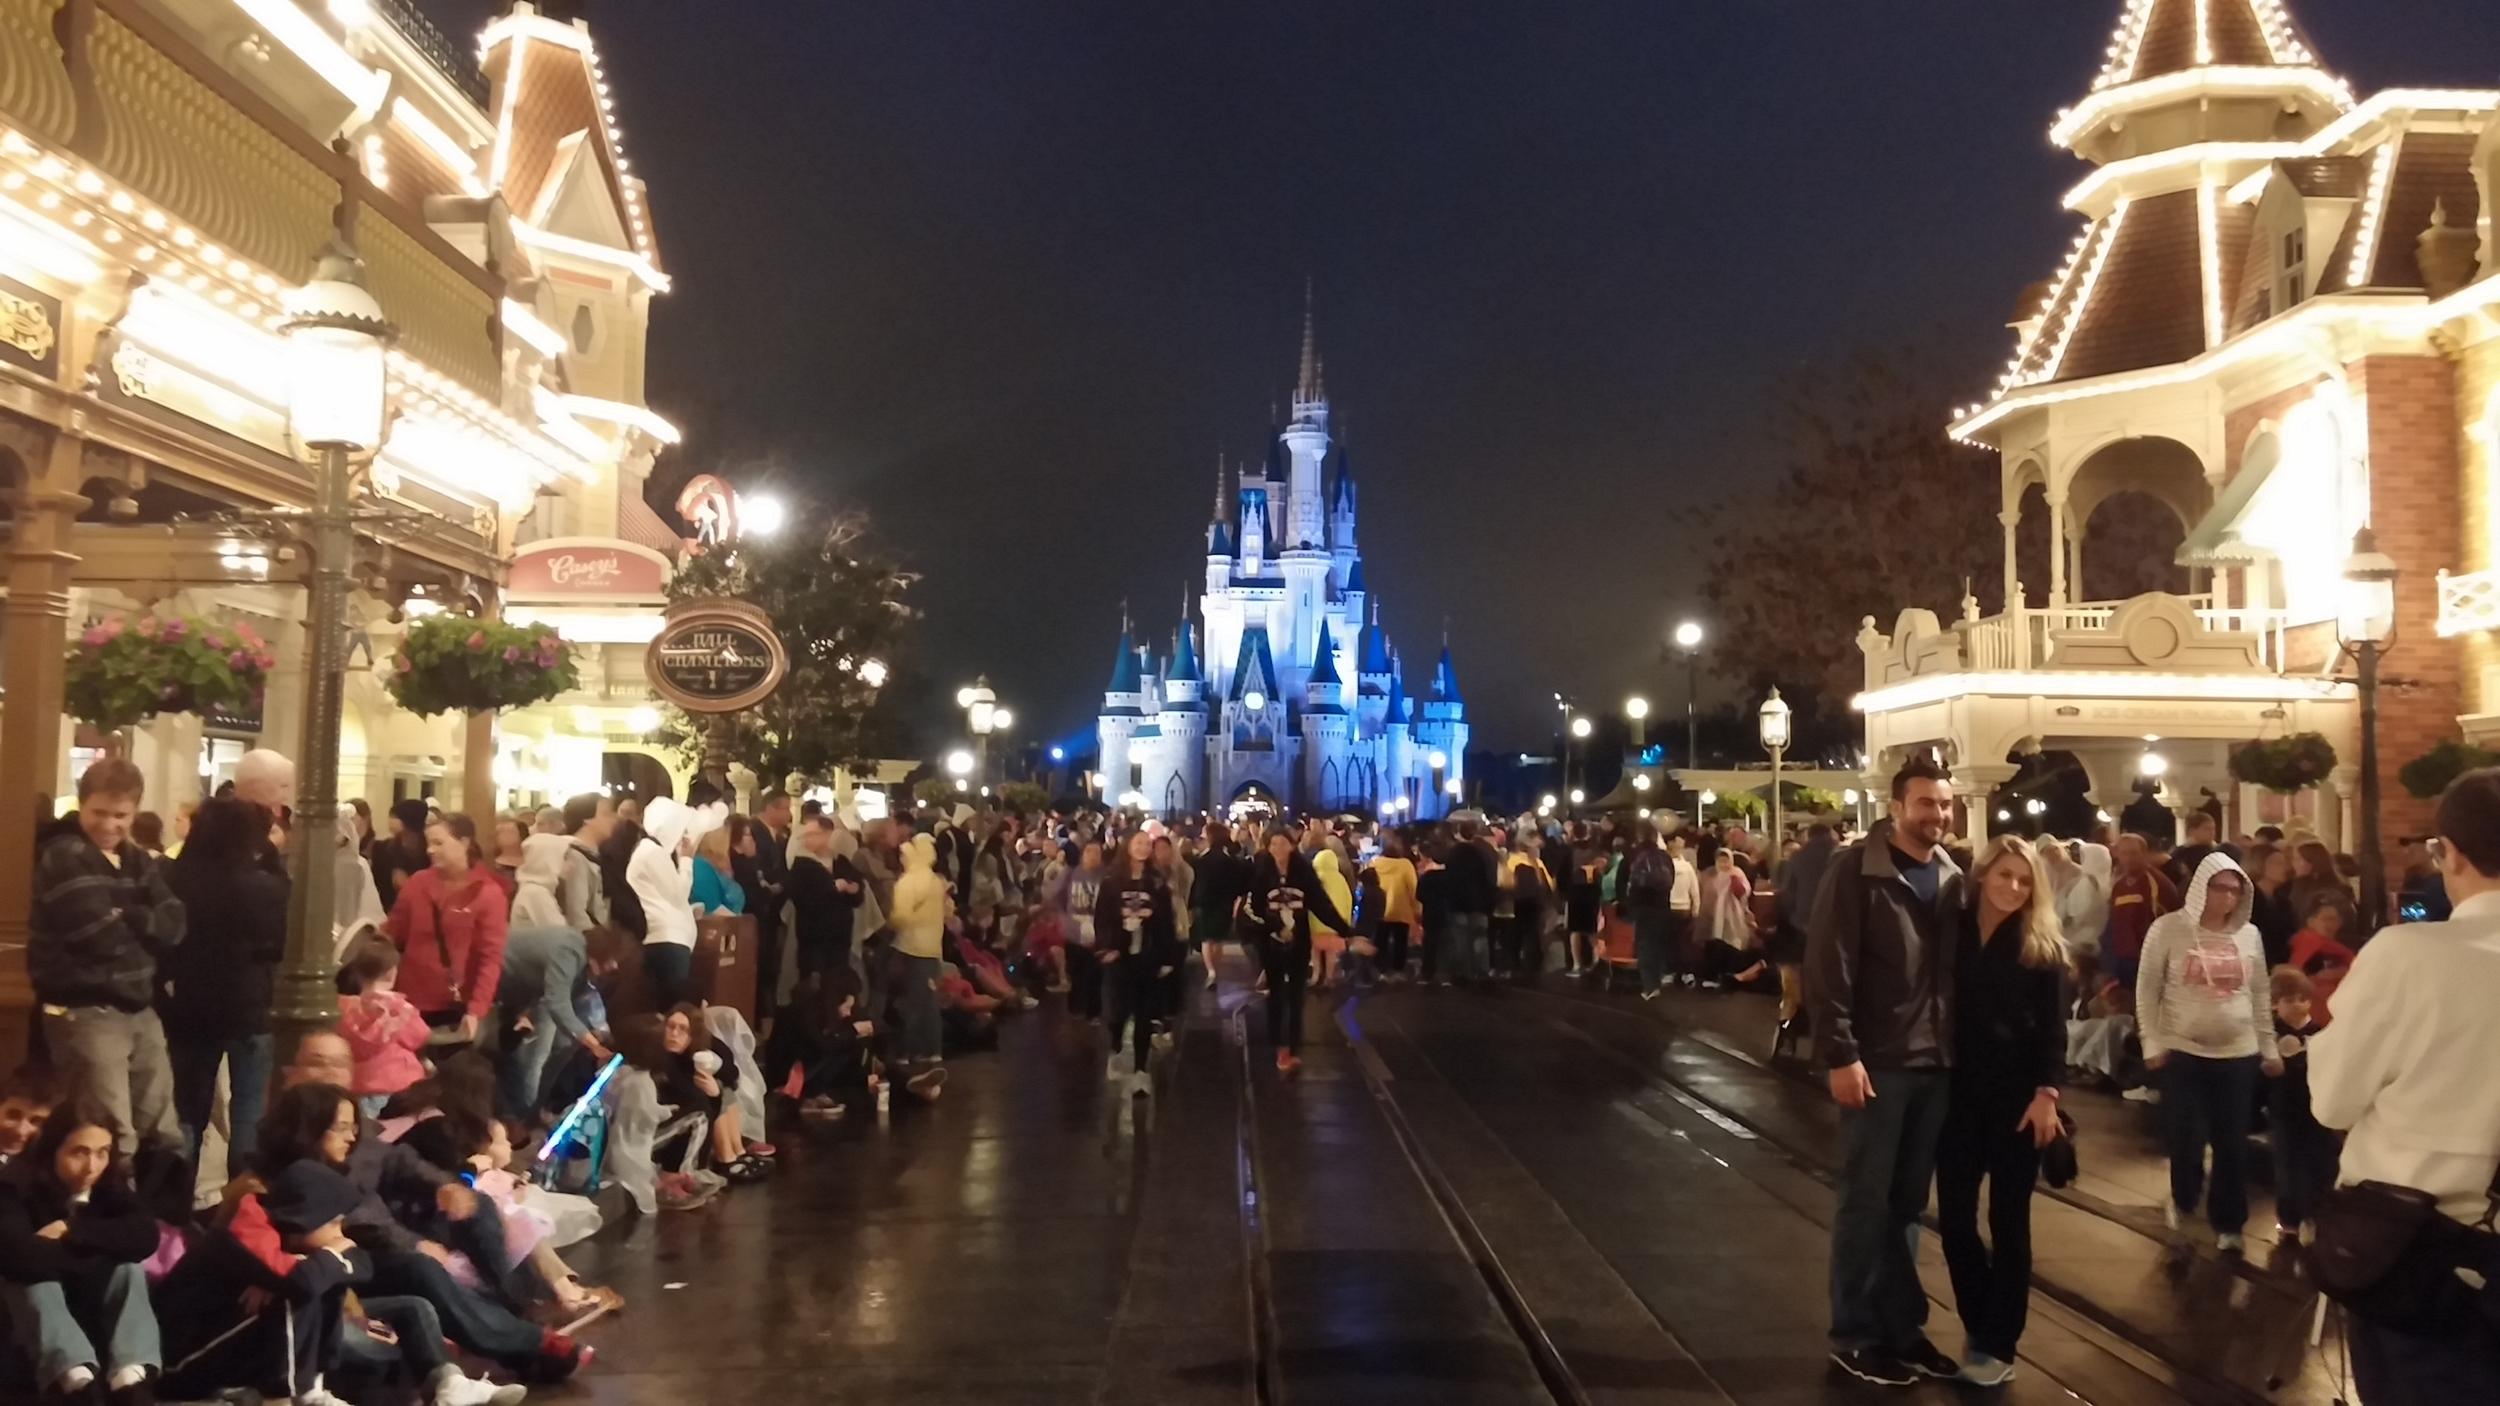 Disney World Magic Kingdom on a chilly rainy evening